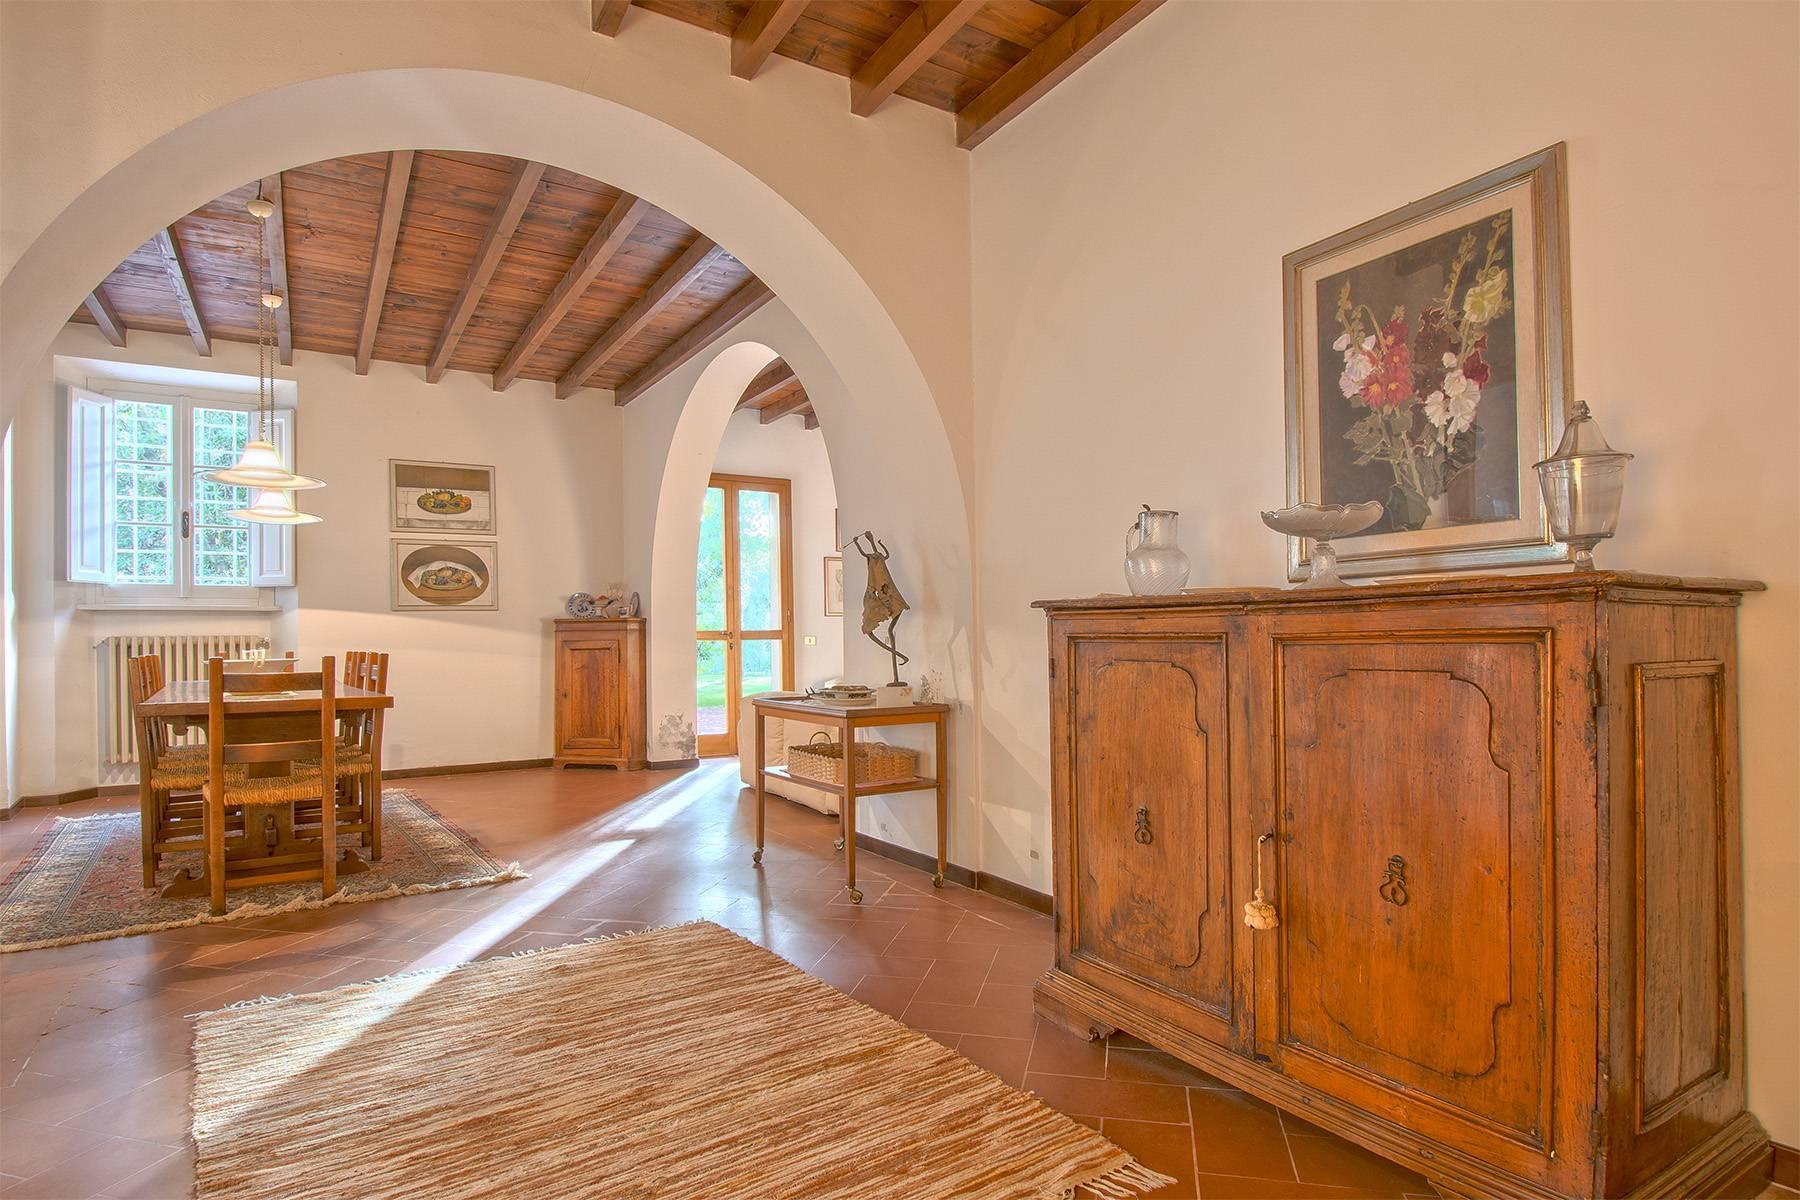 Winery with Historic Villa in San Miniato, Pisa - 12